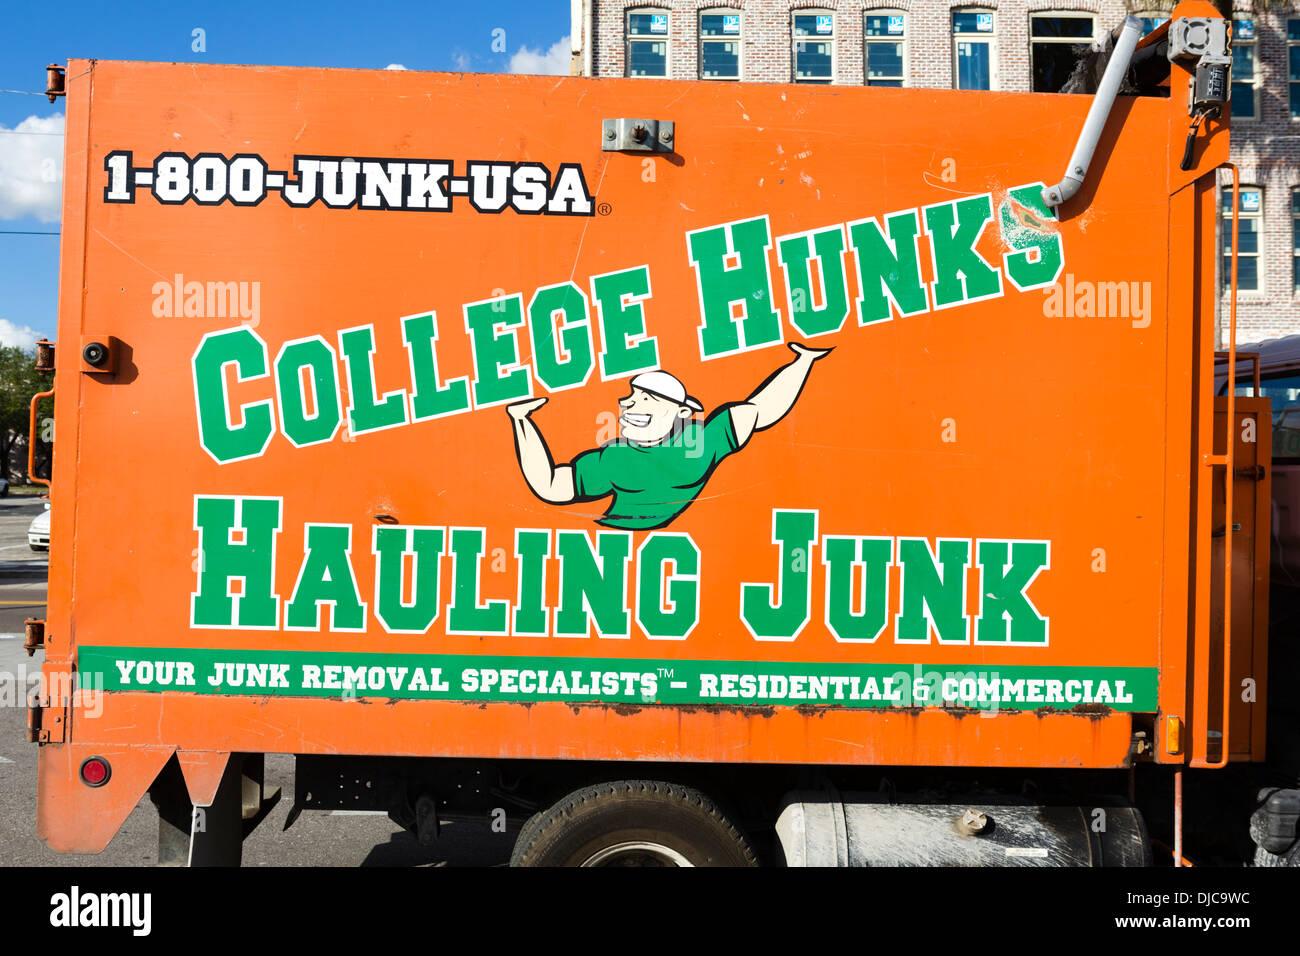 "Ein Umzug LKW für ""College Hunks, schleppen Junk"" Ybor City, Tampa, Florida, USA Stockbild"